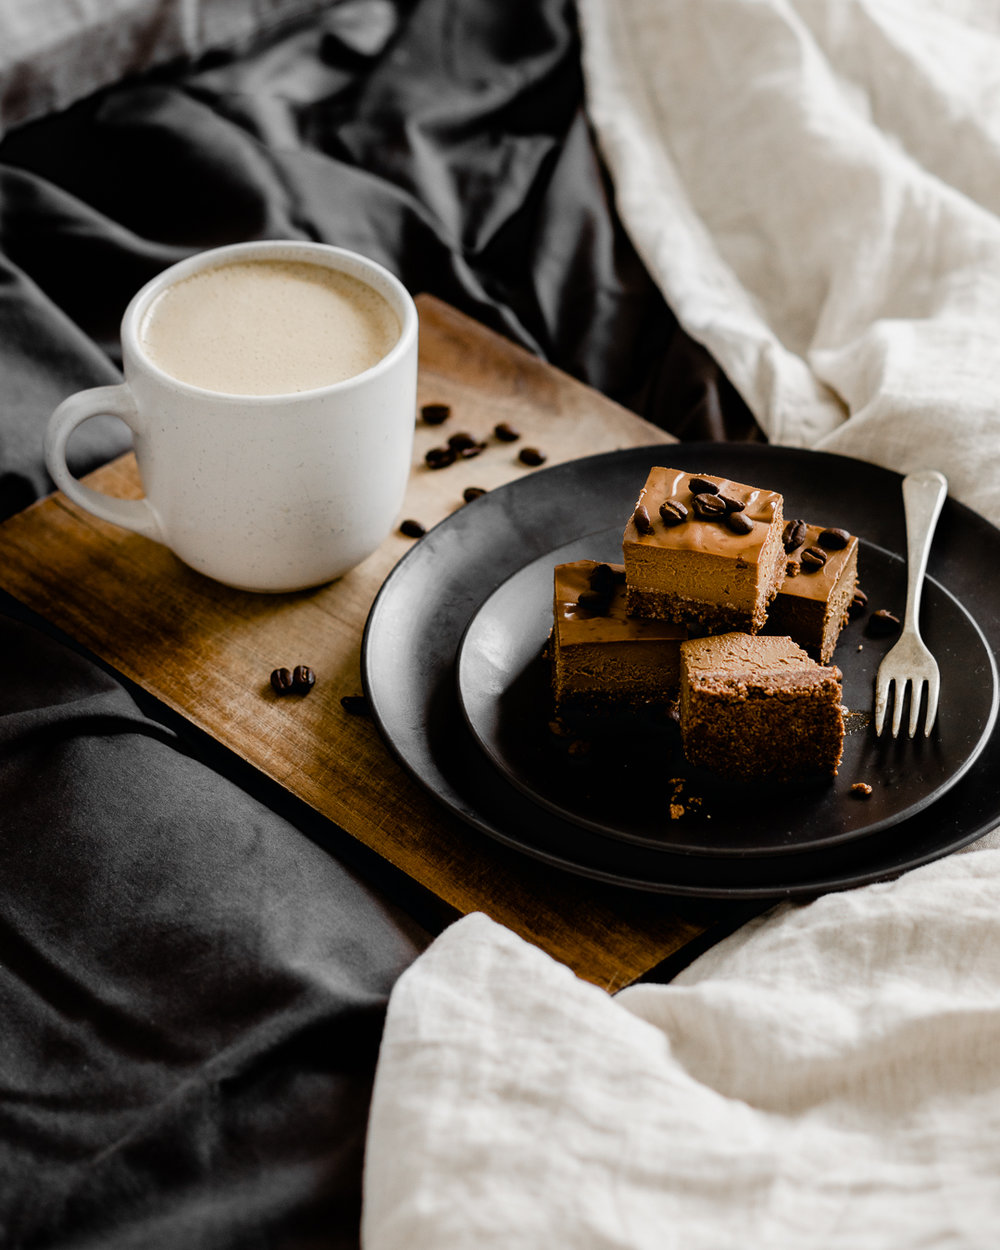 Keto_Espresso_FudgeSlice_by_Jordan_Pie_Nutritionist_Photographer-1.jpg